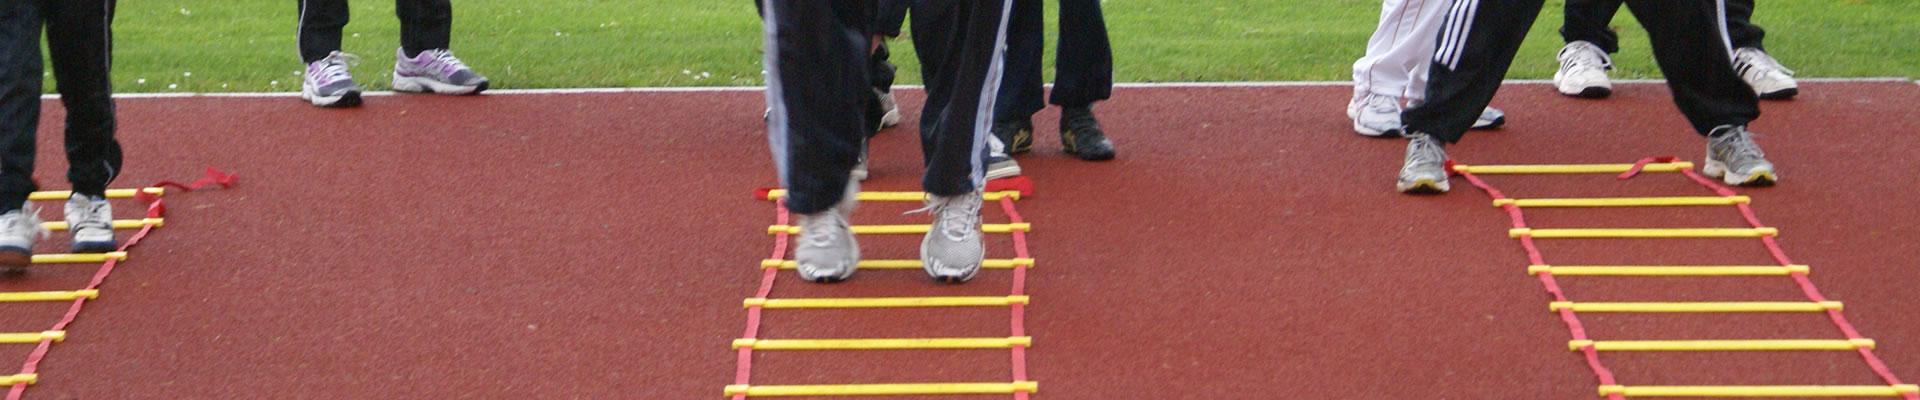 nationaalbureausportstimulering